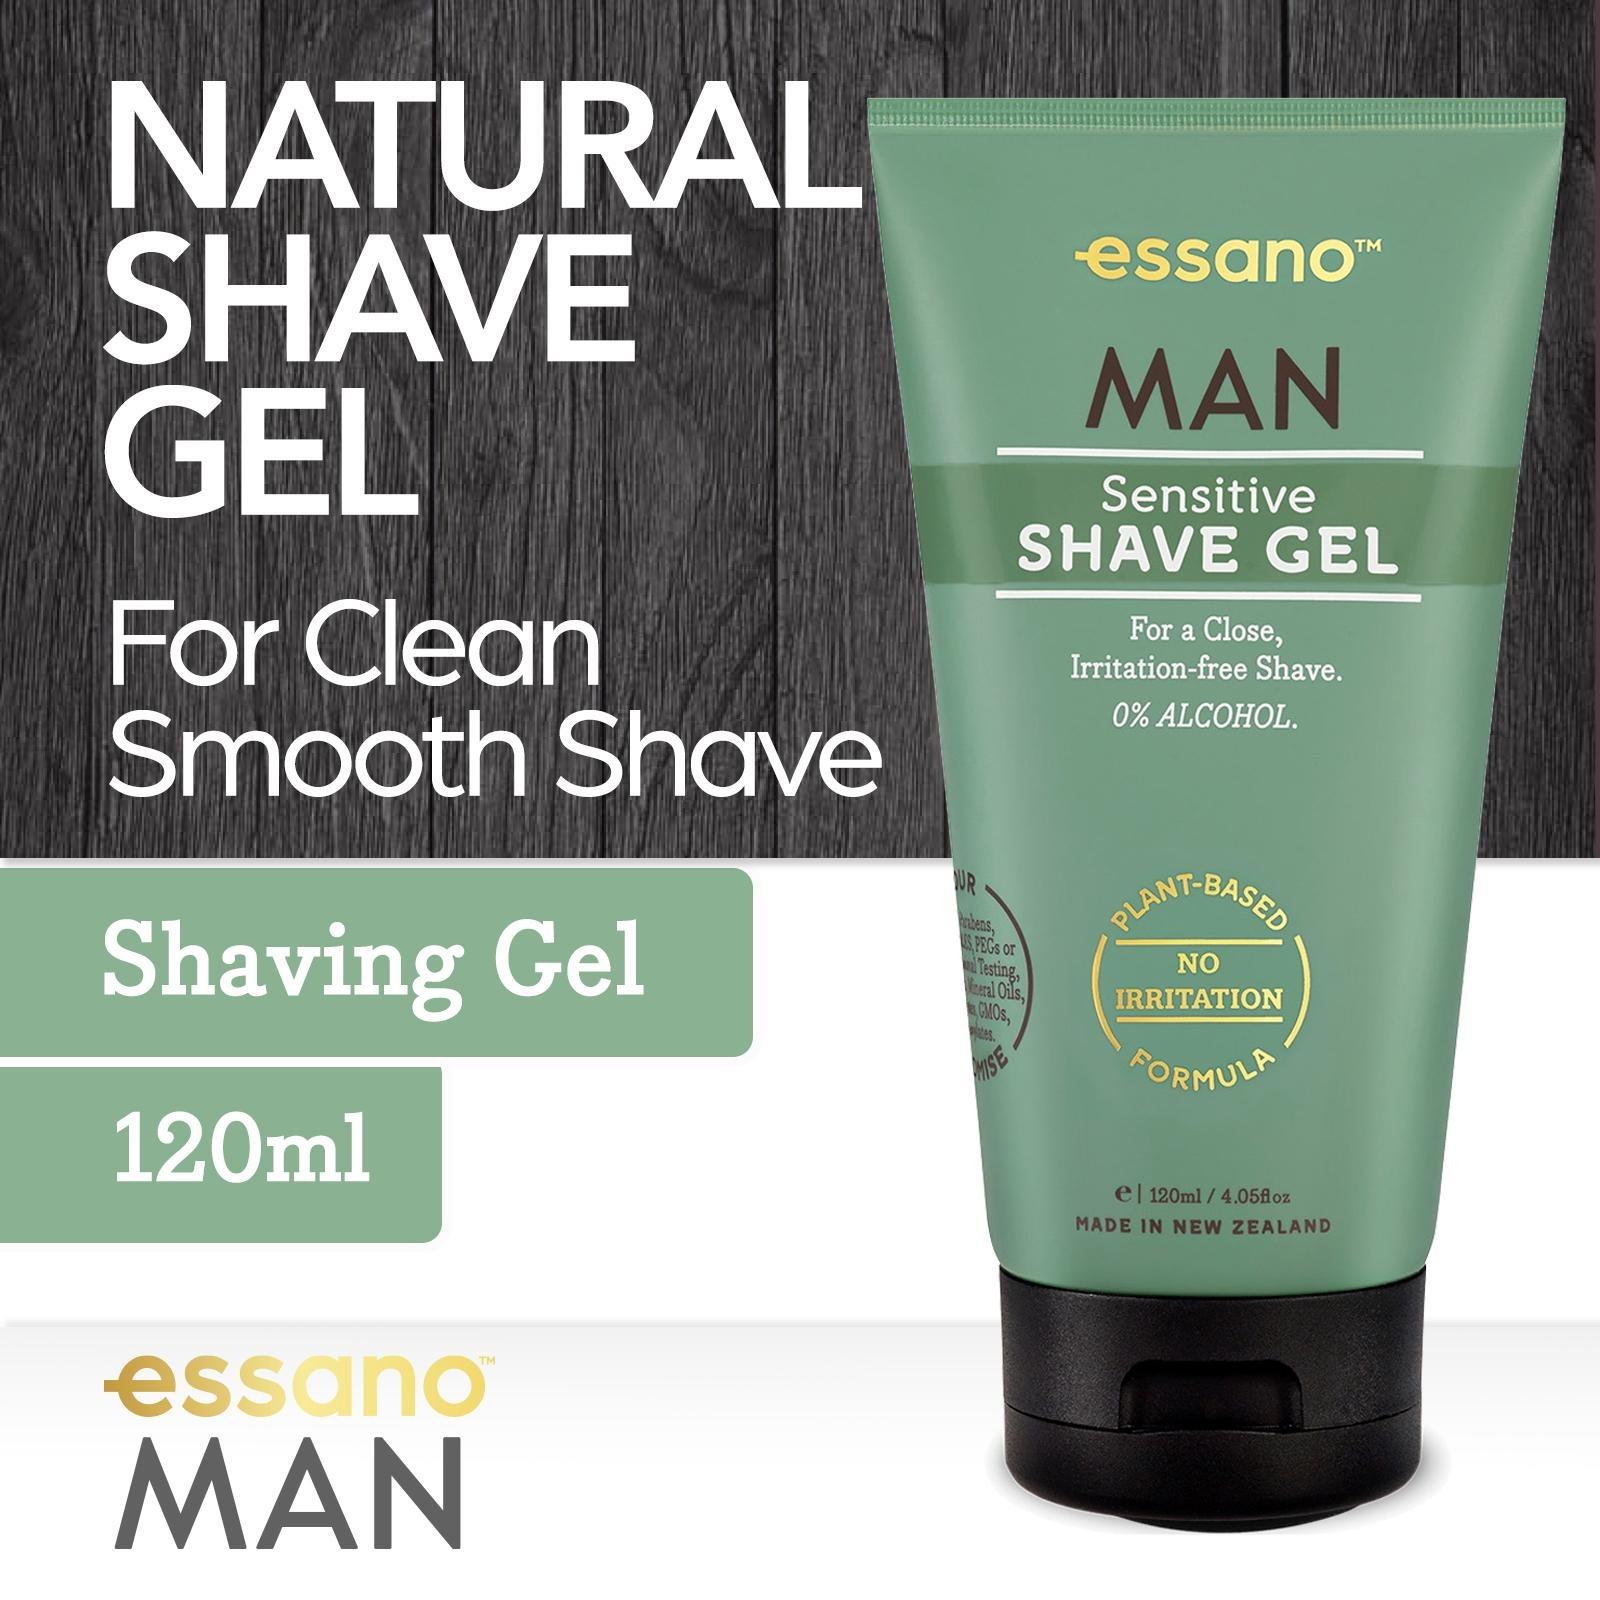 Essano Man Shave Gel Sensitive